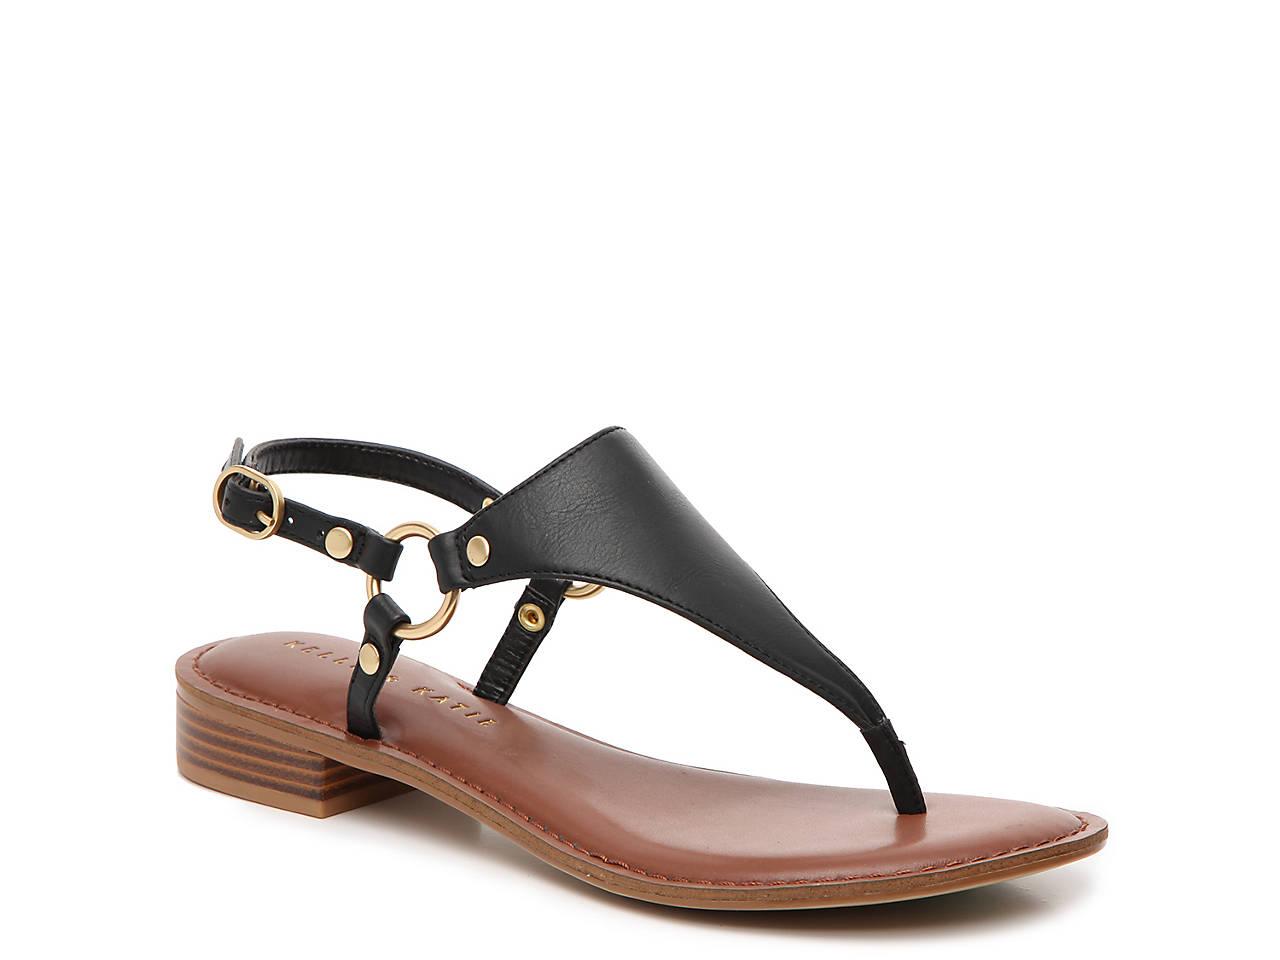 6b8c78ec4945 Kelly   Katie Bania Flat Sandal Women s Shoes